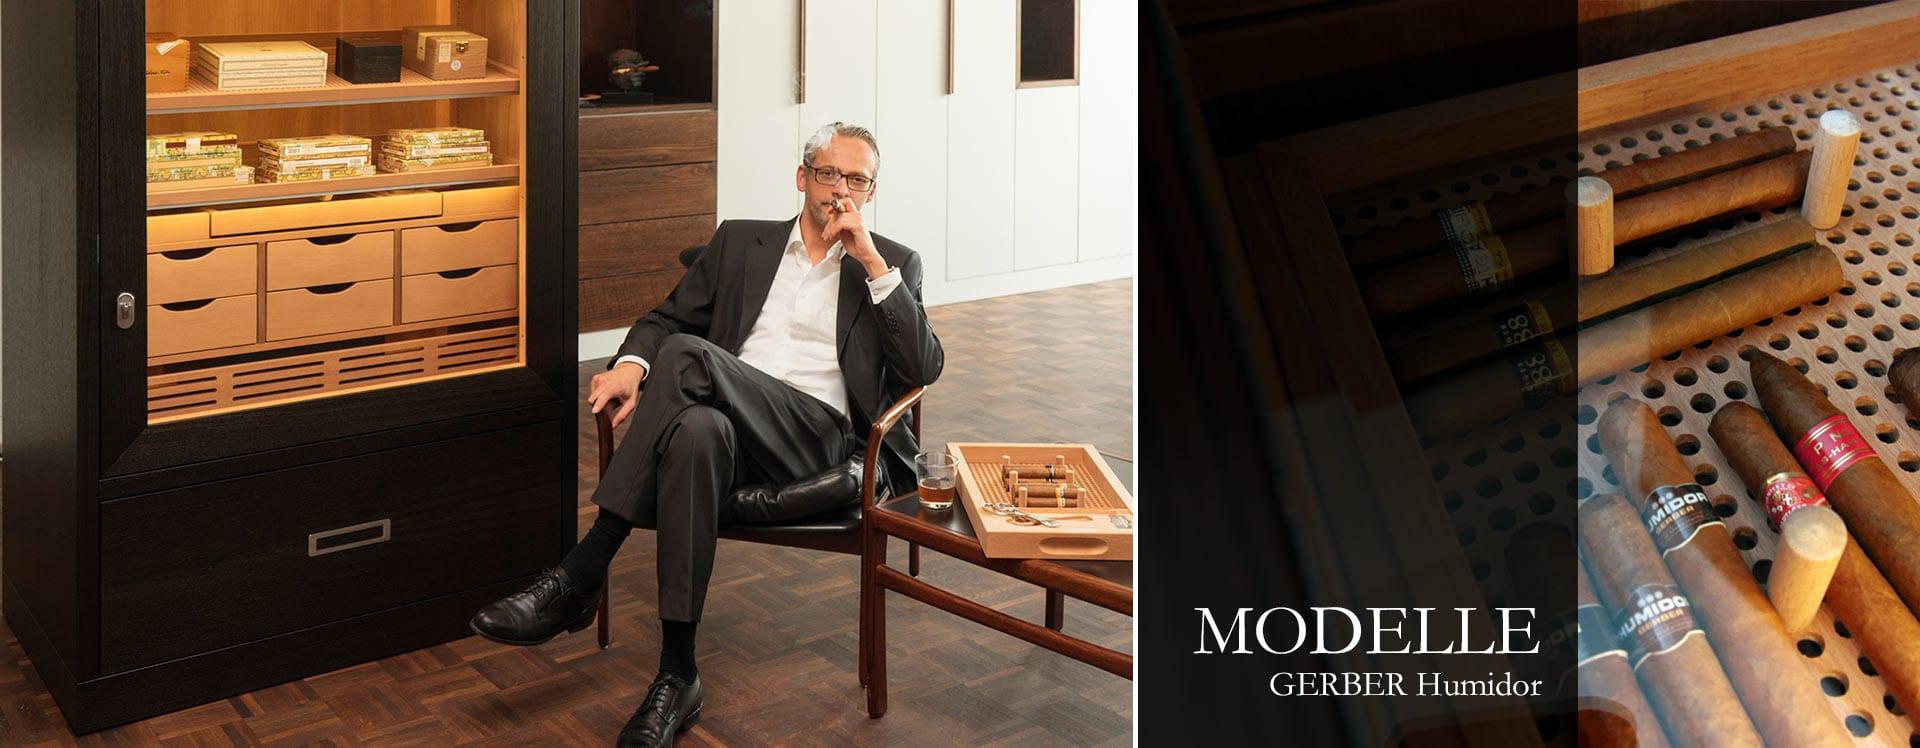 Humidor Modelle Gerber Humidore